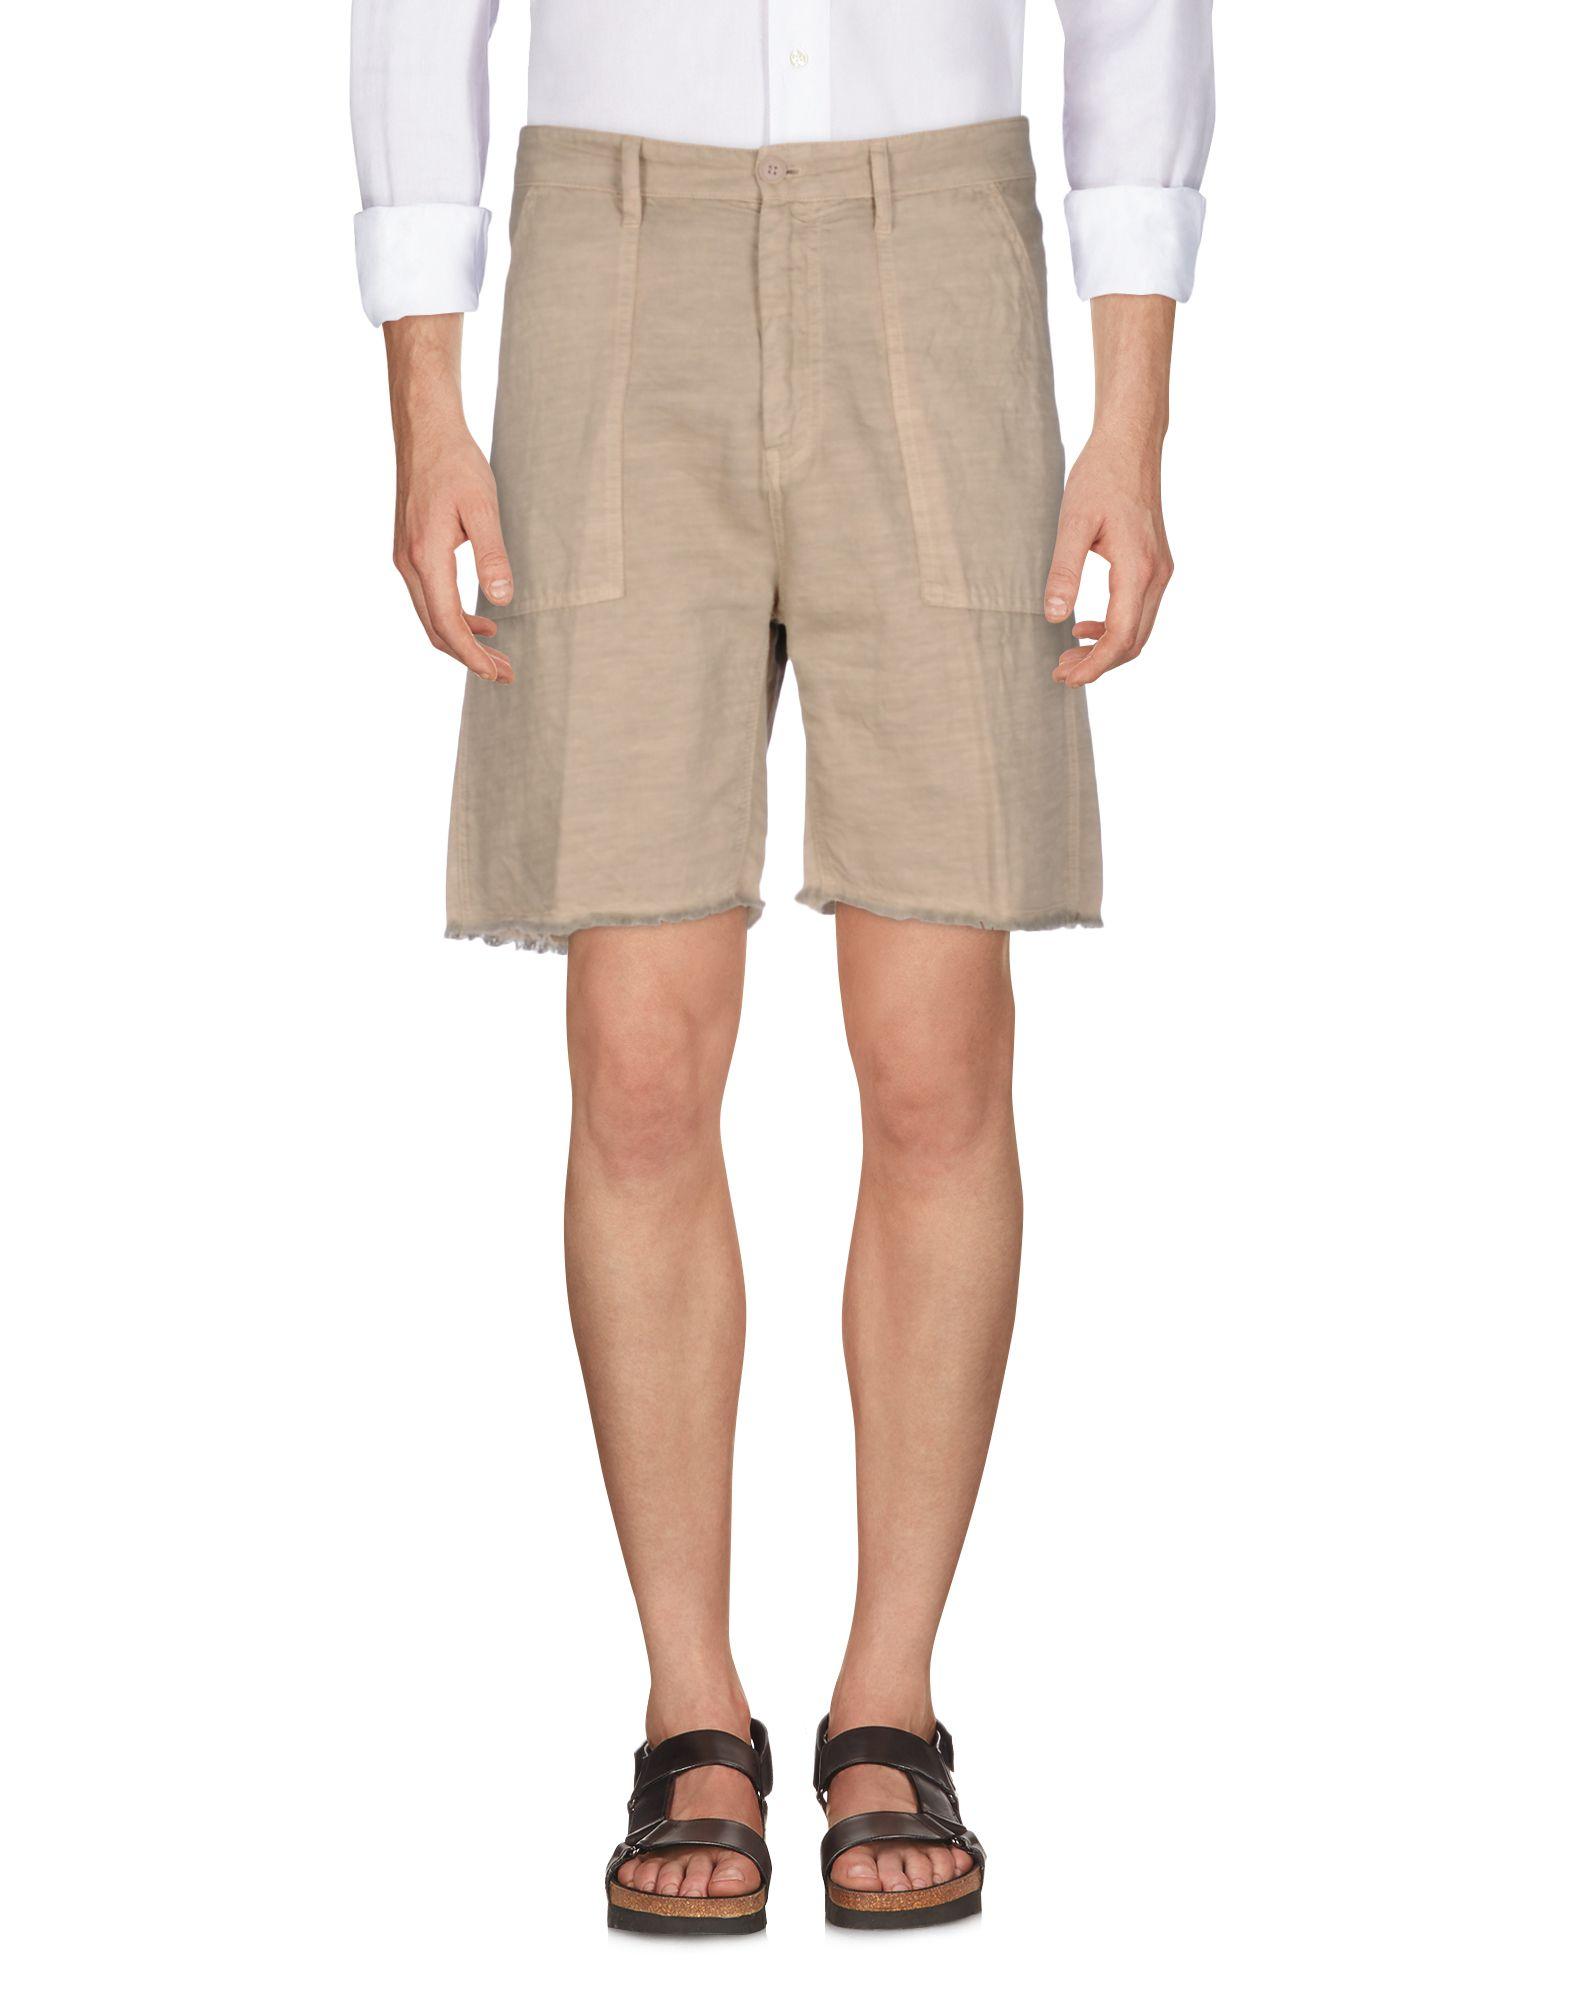 Shoppable Search Andrew Smith Bermuda Shorts Cokelat 30 13089100op 14 F